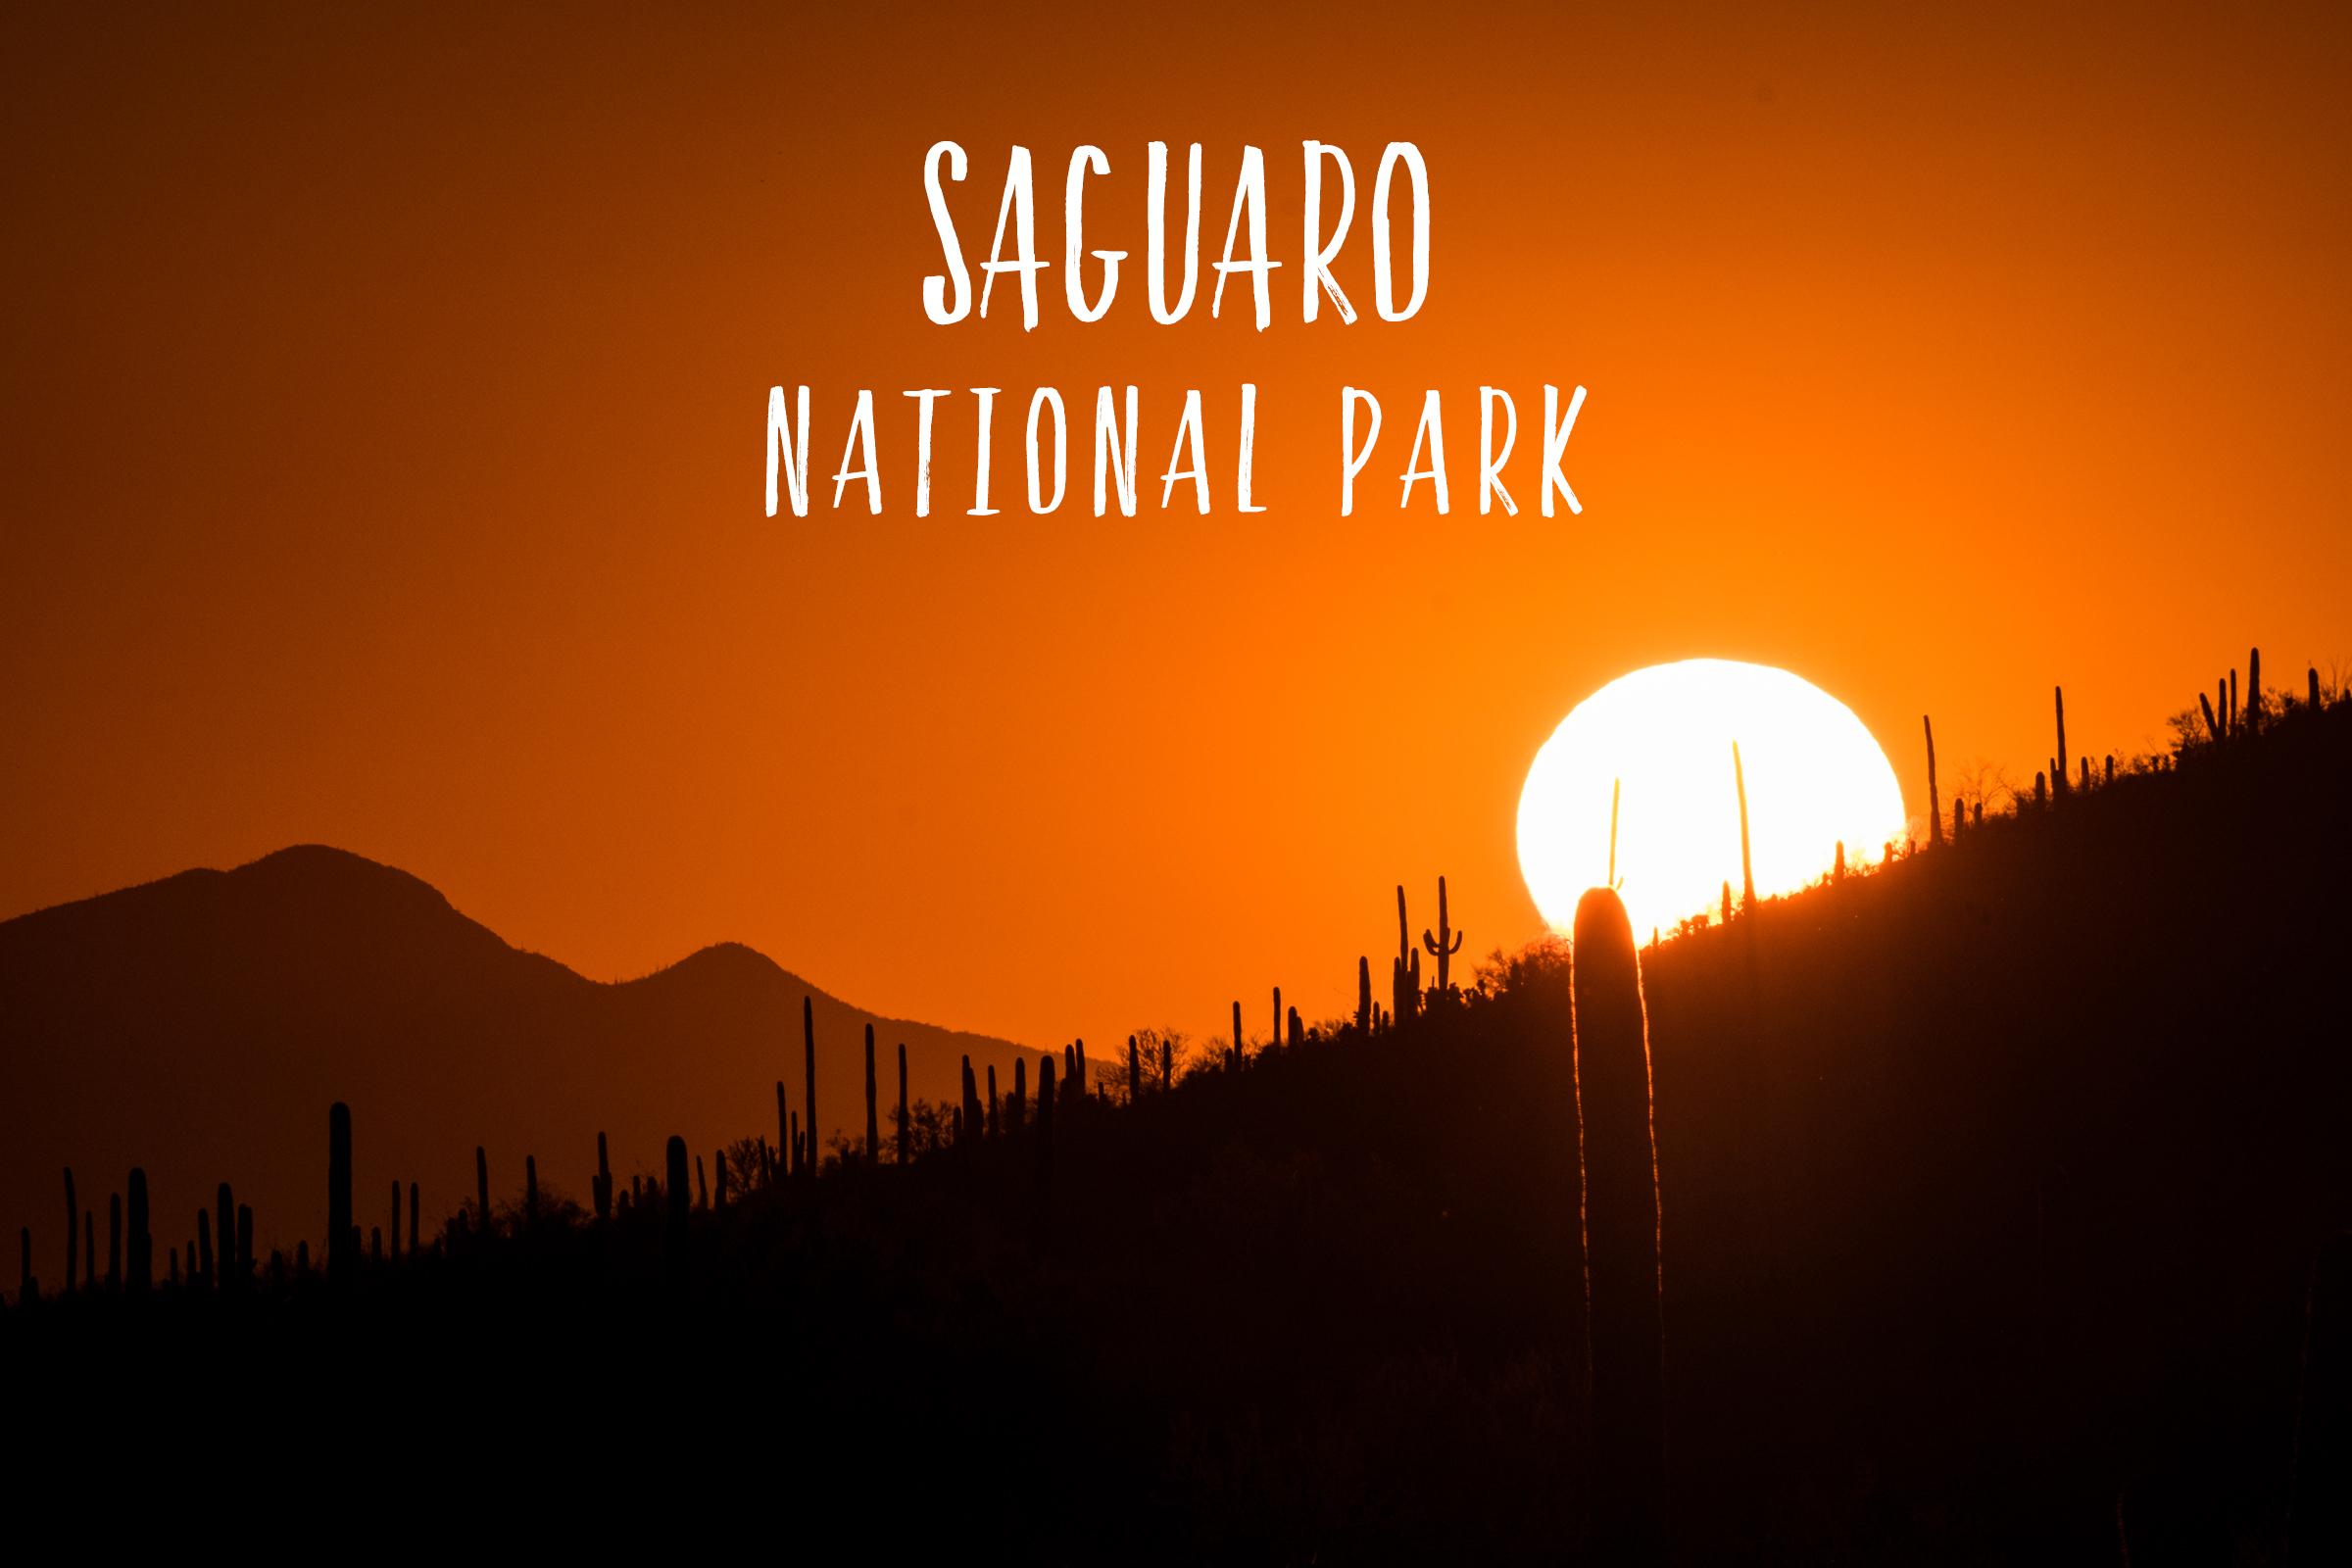 59in52_np-page_saguaro.jpg